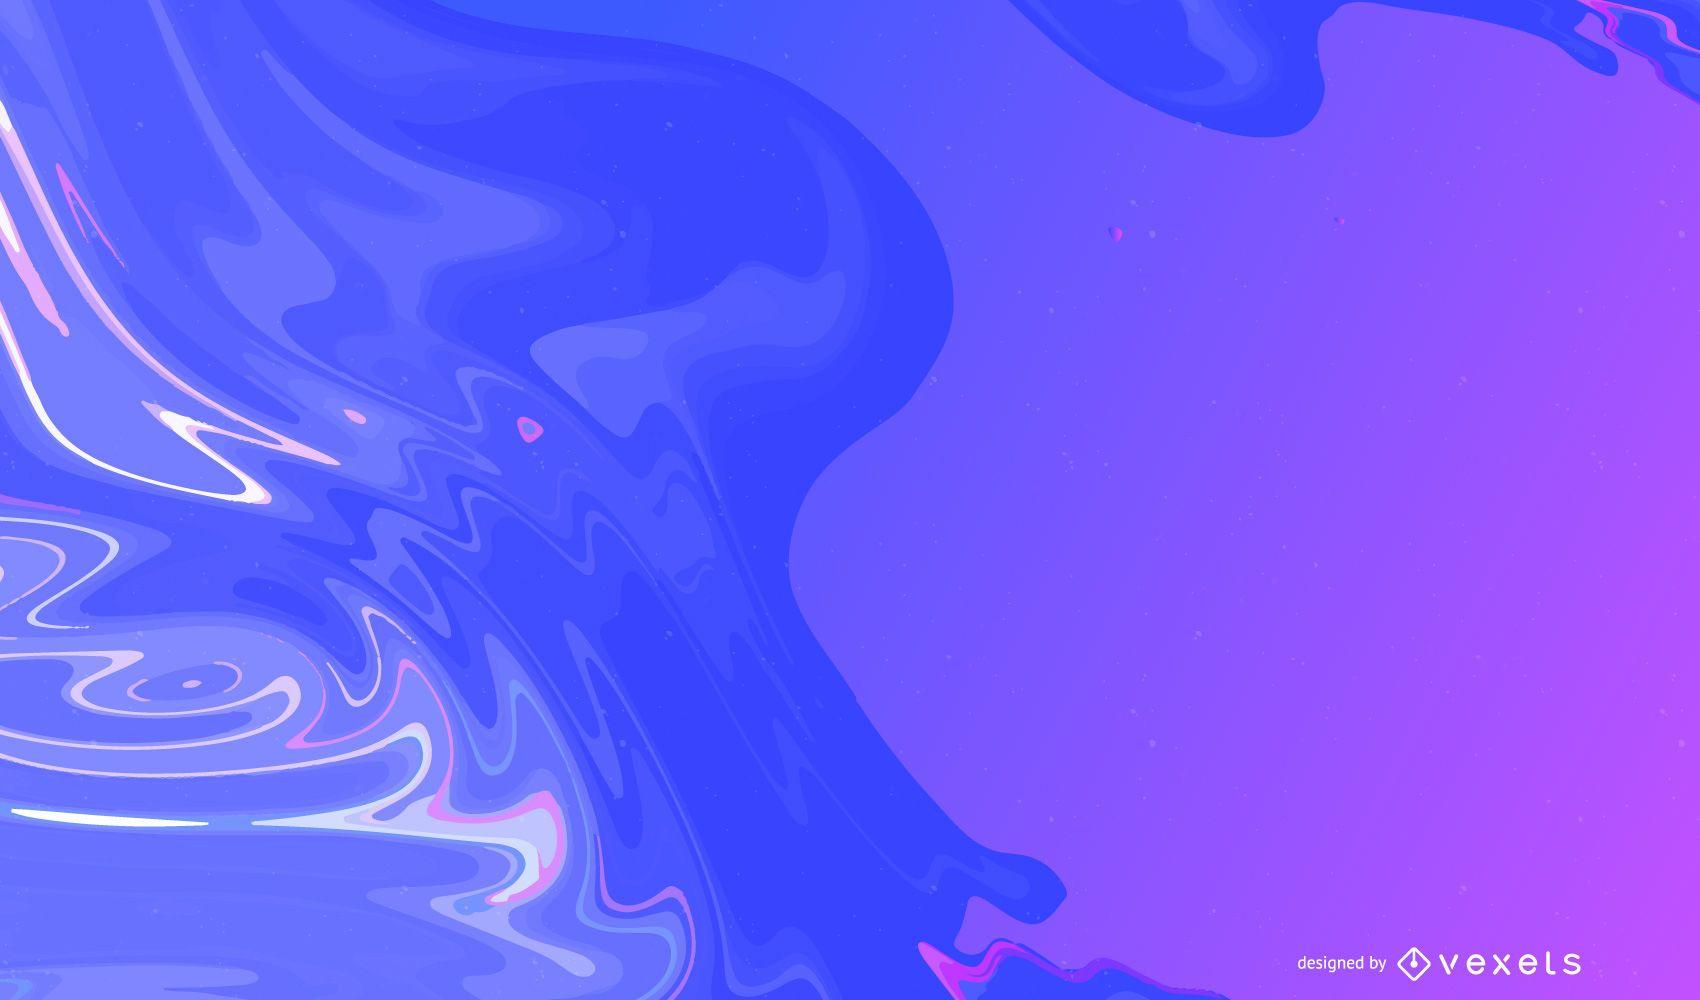 Fondo de plantilla de ondas sedosas coloridas